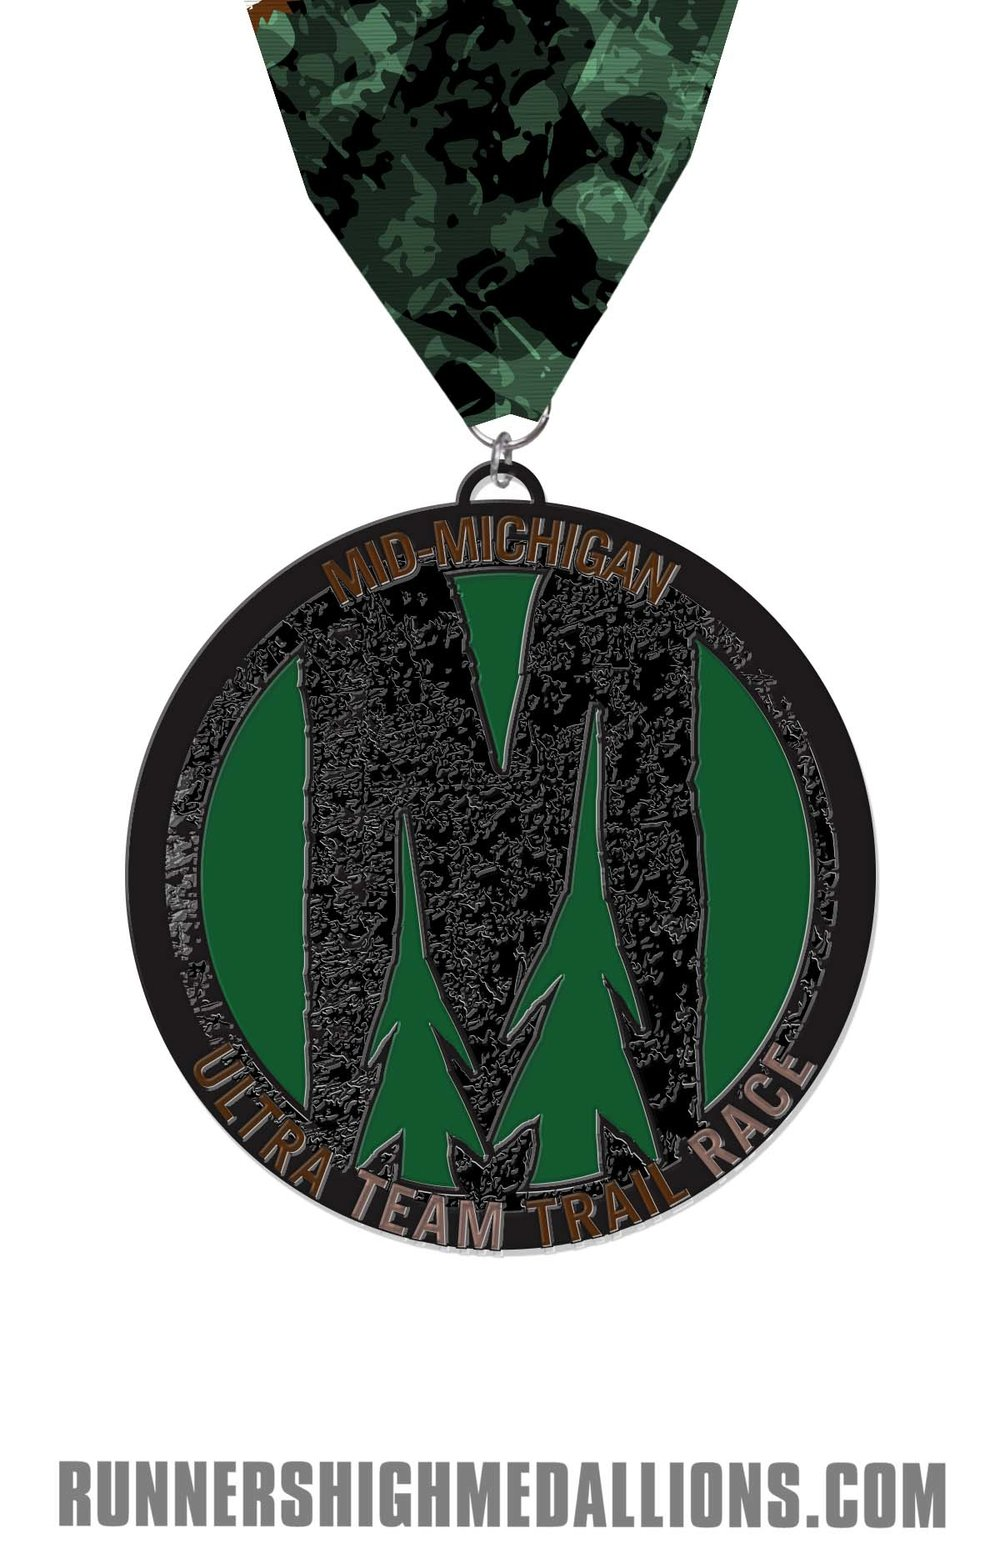 2019 Finisher medal